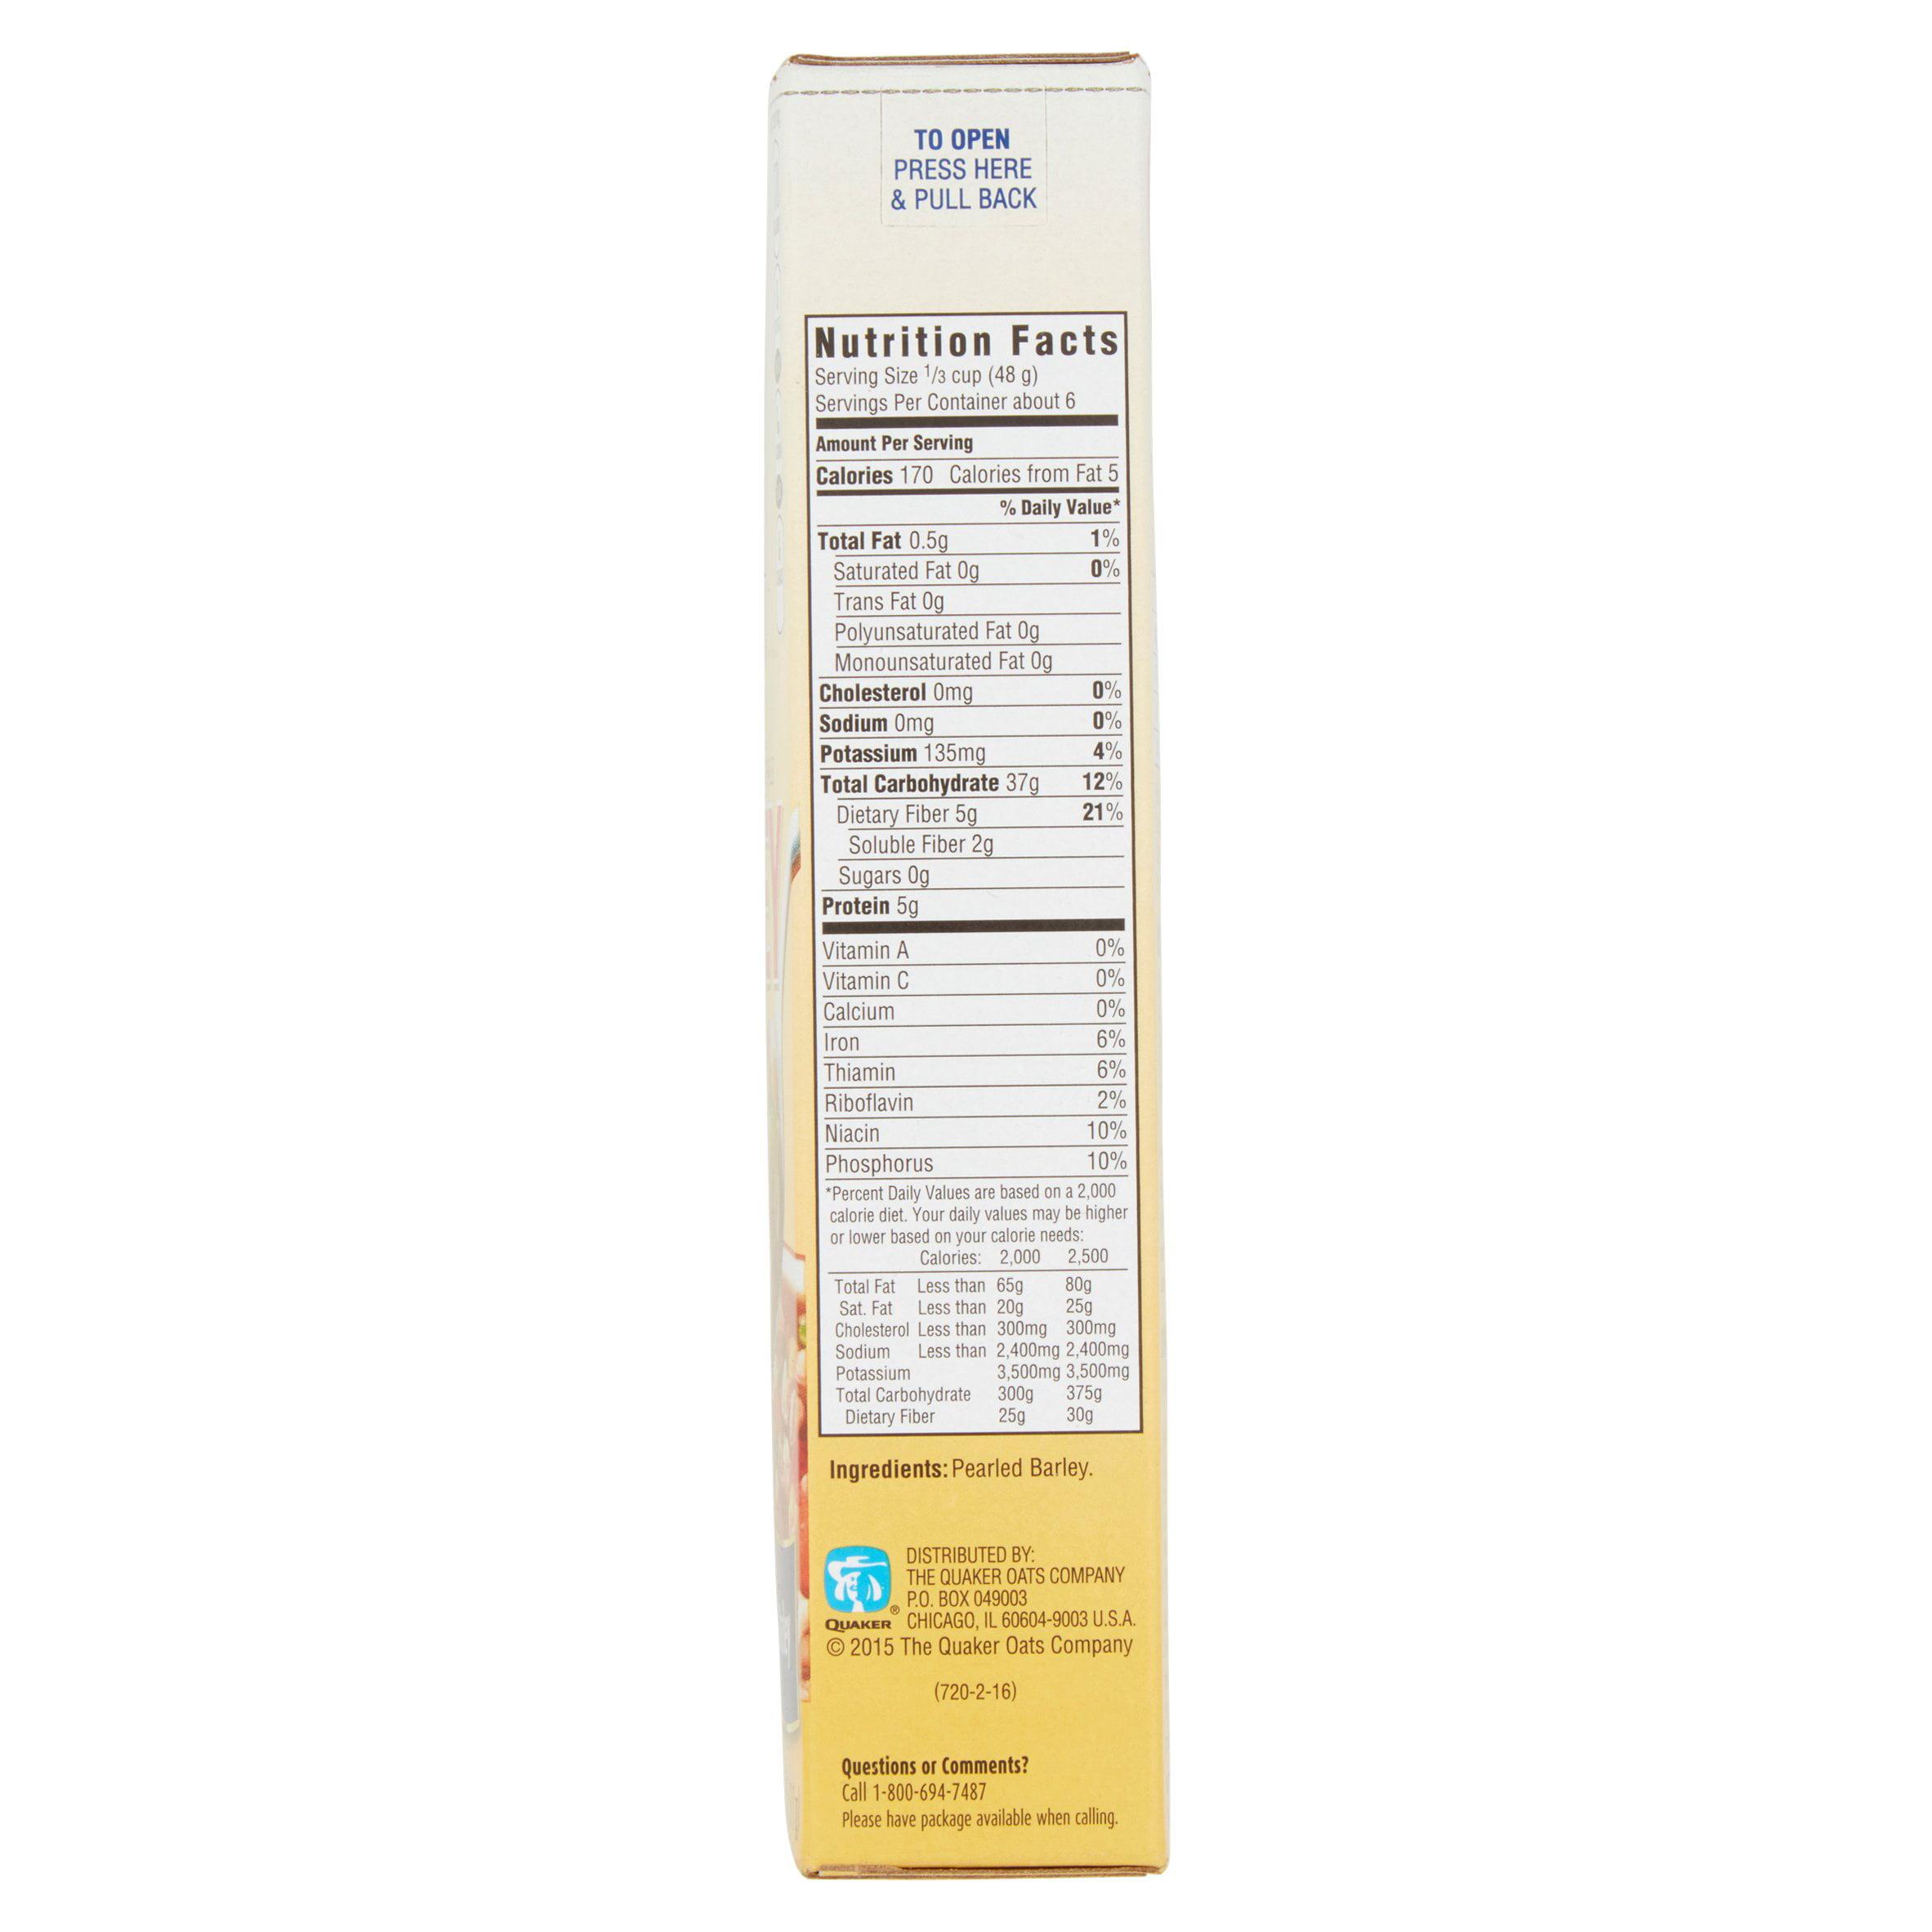 Quaker Quick Pearled Barley, 11 oz Box